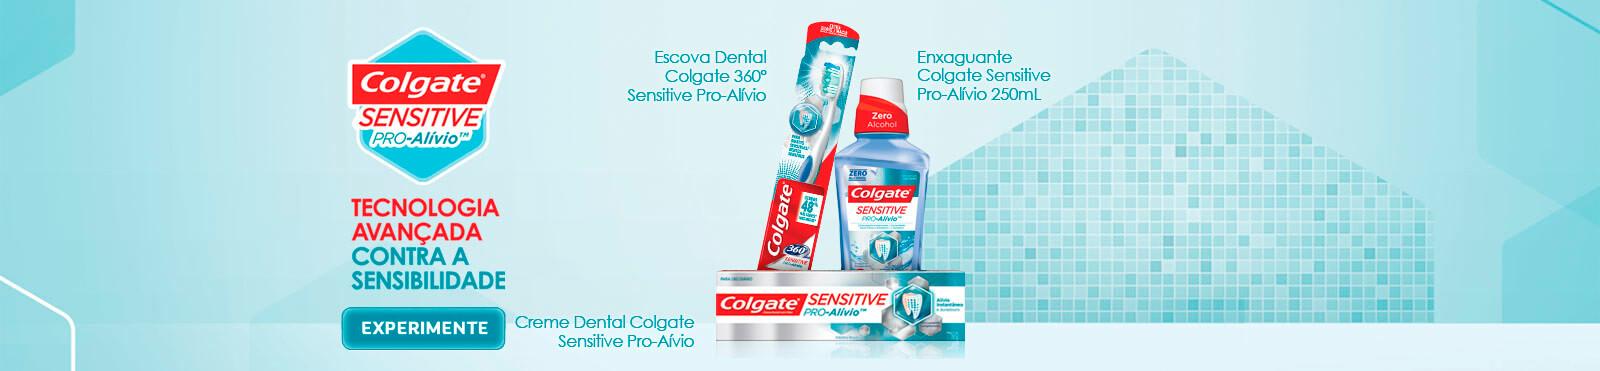 superbanner-colgate-sensitive-pro-alivio-farmacia-online-sp